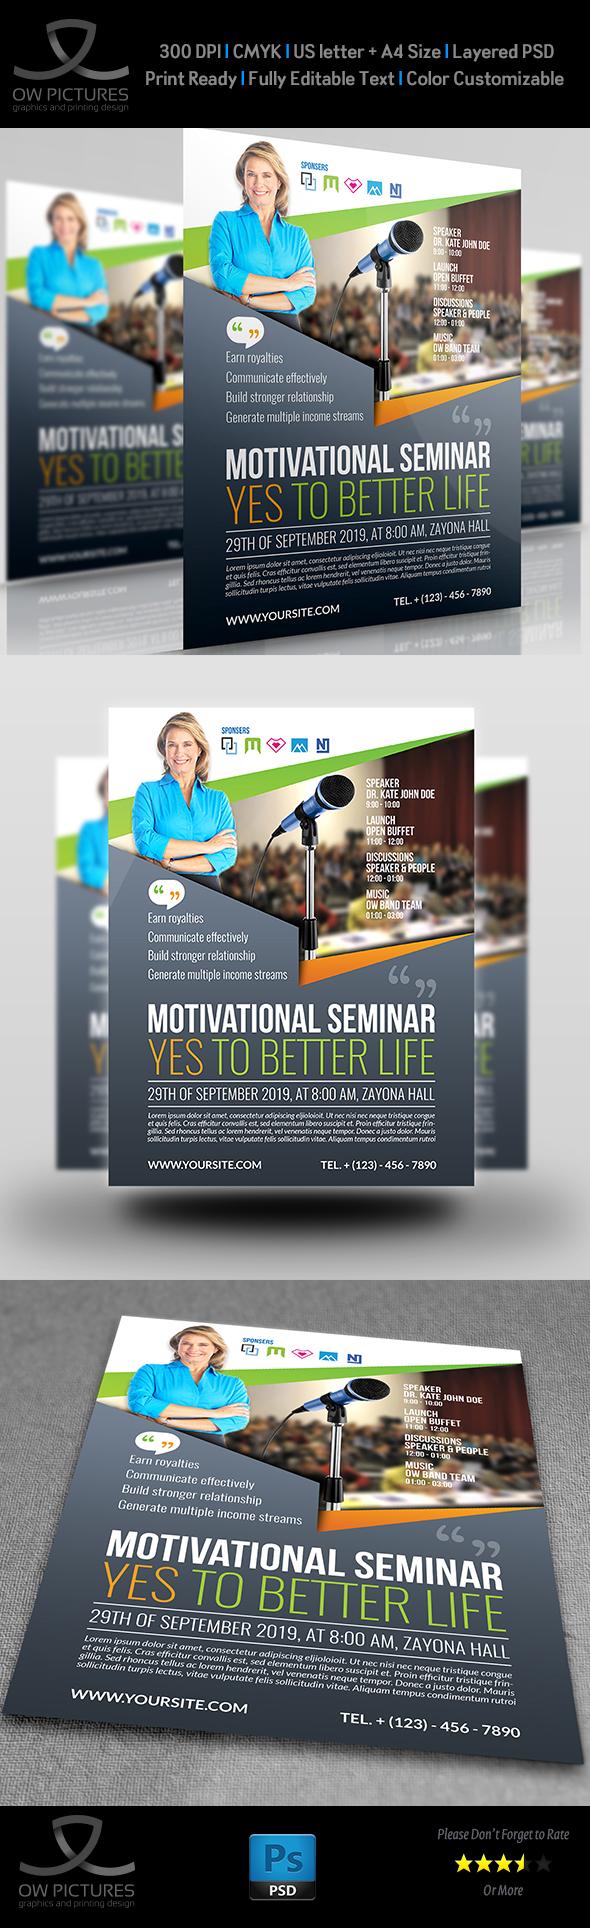 Seminar Flyer Templates on Behance